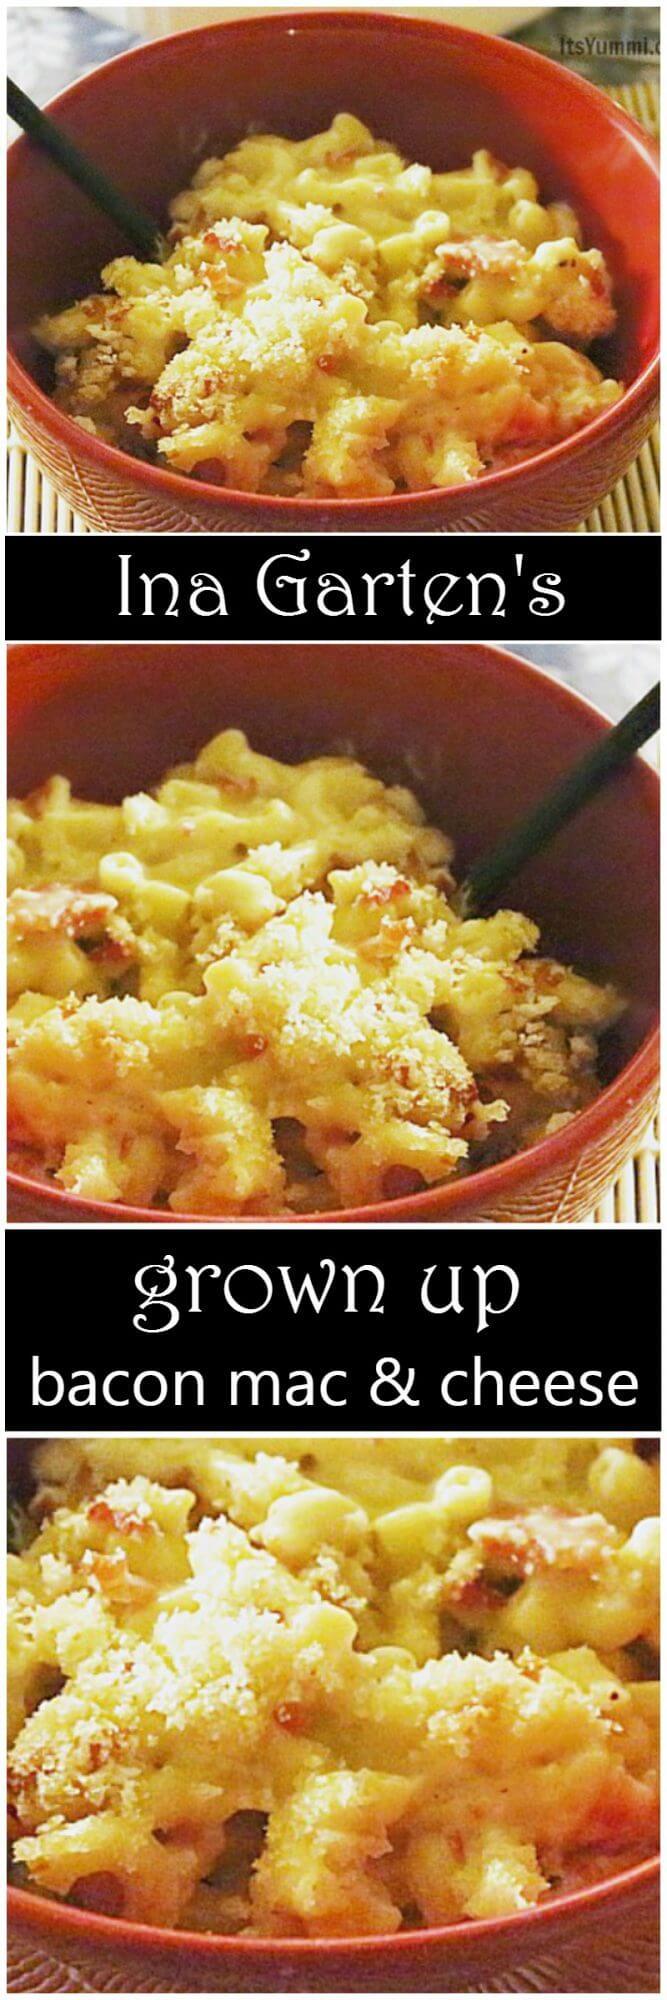 ina garten's grown up bacon mac and cheese ⋆ its yummi